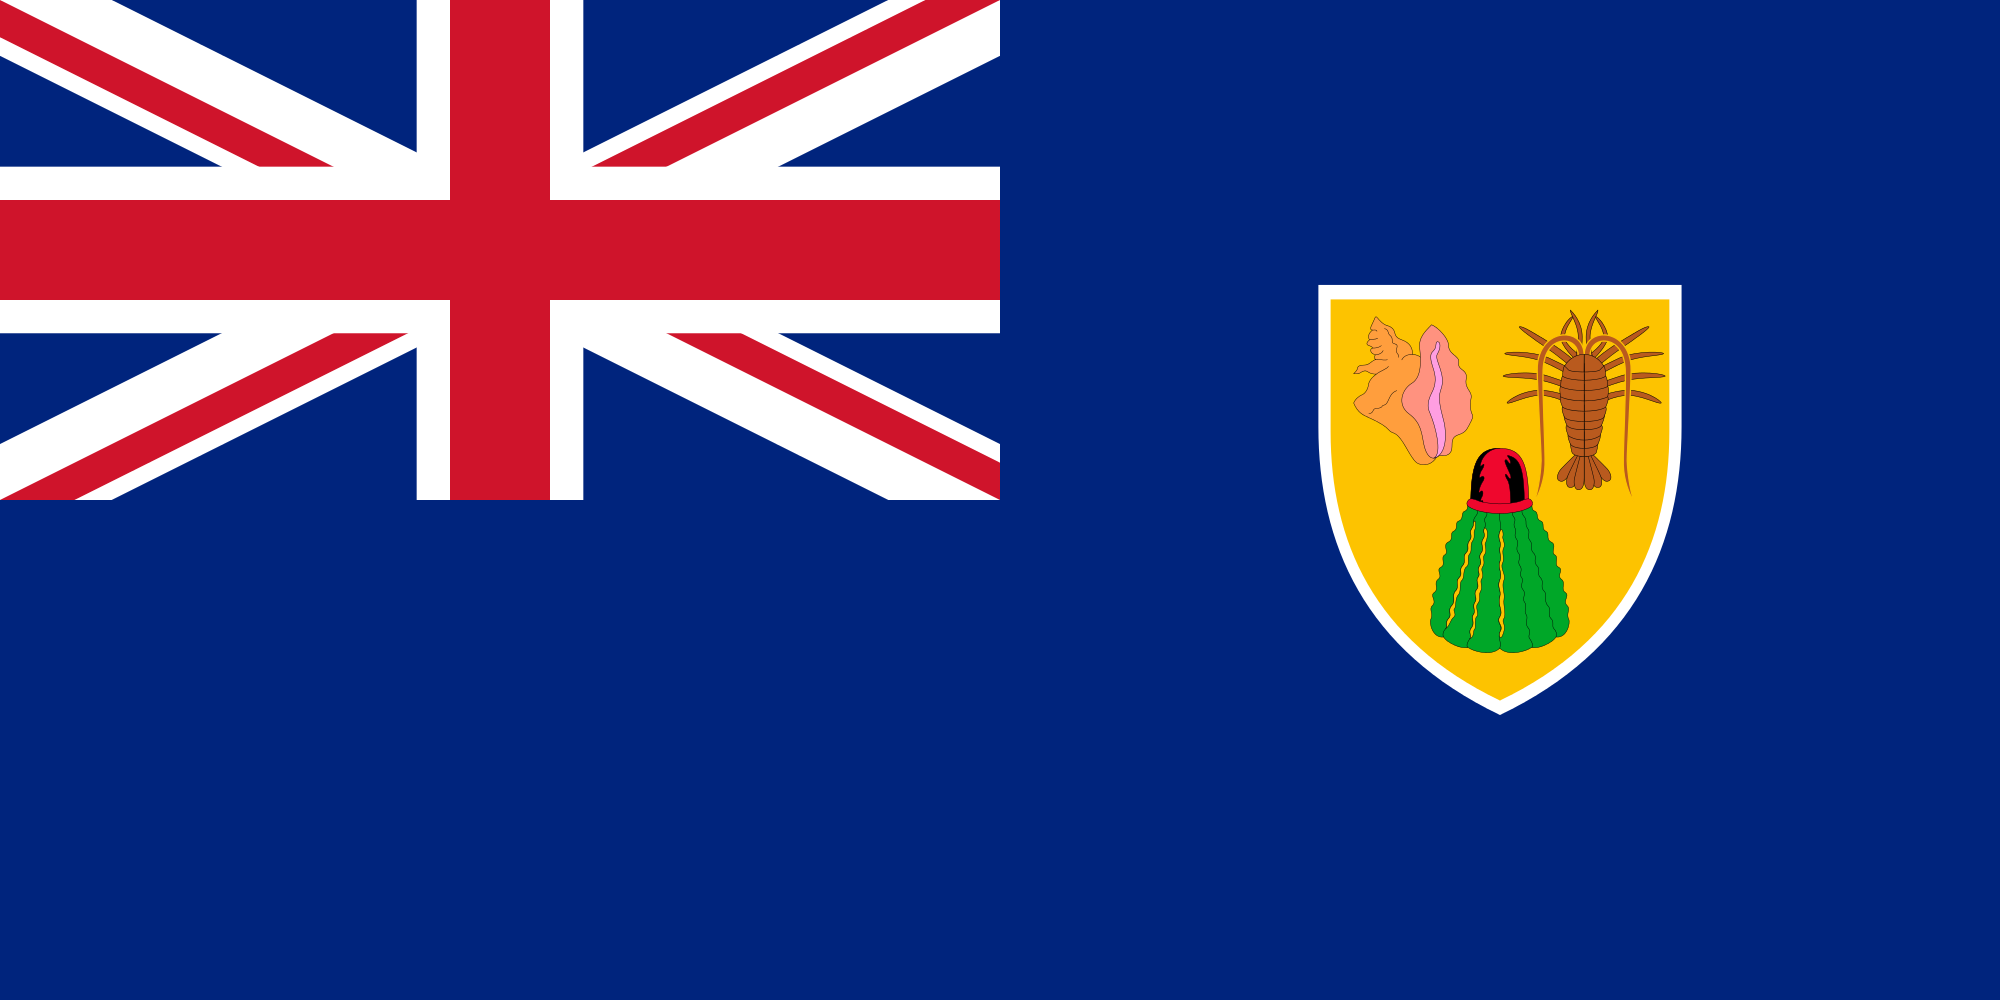 Turc îles Turques et Caïques, pays, emblème, logo, symbole - Fonds d'écran HD - Professor-falken.com